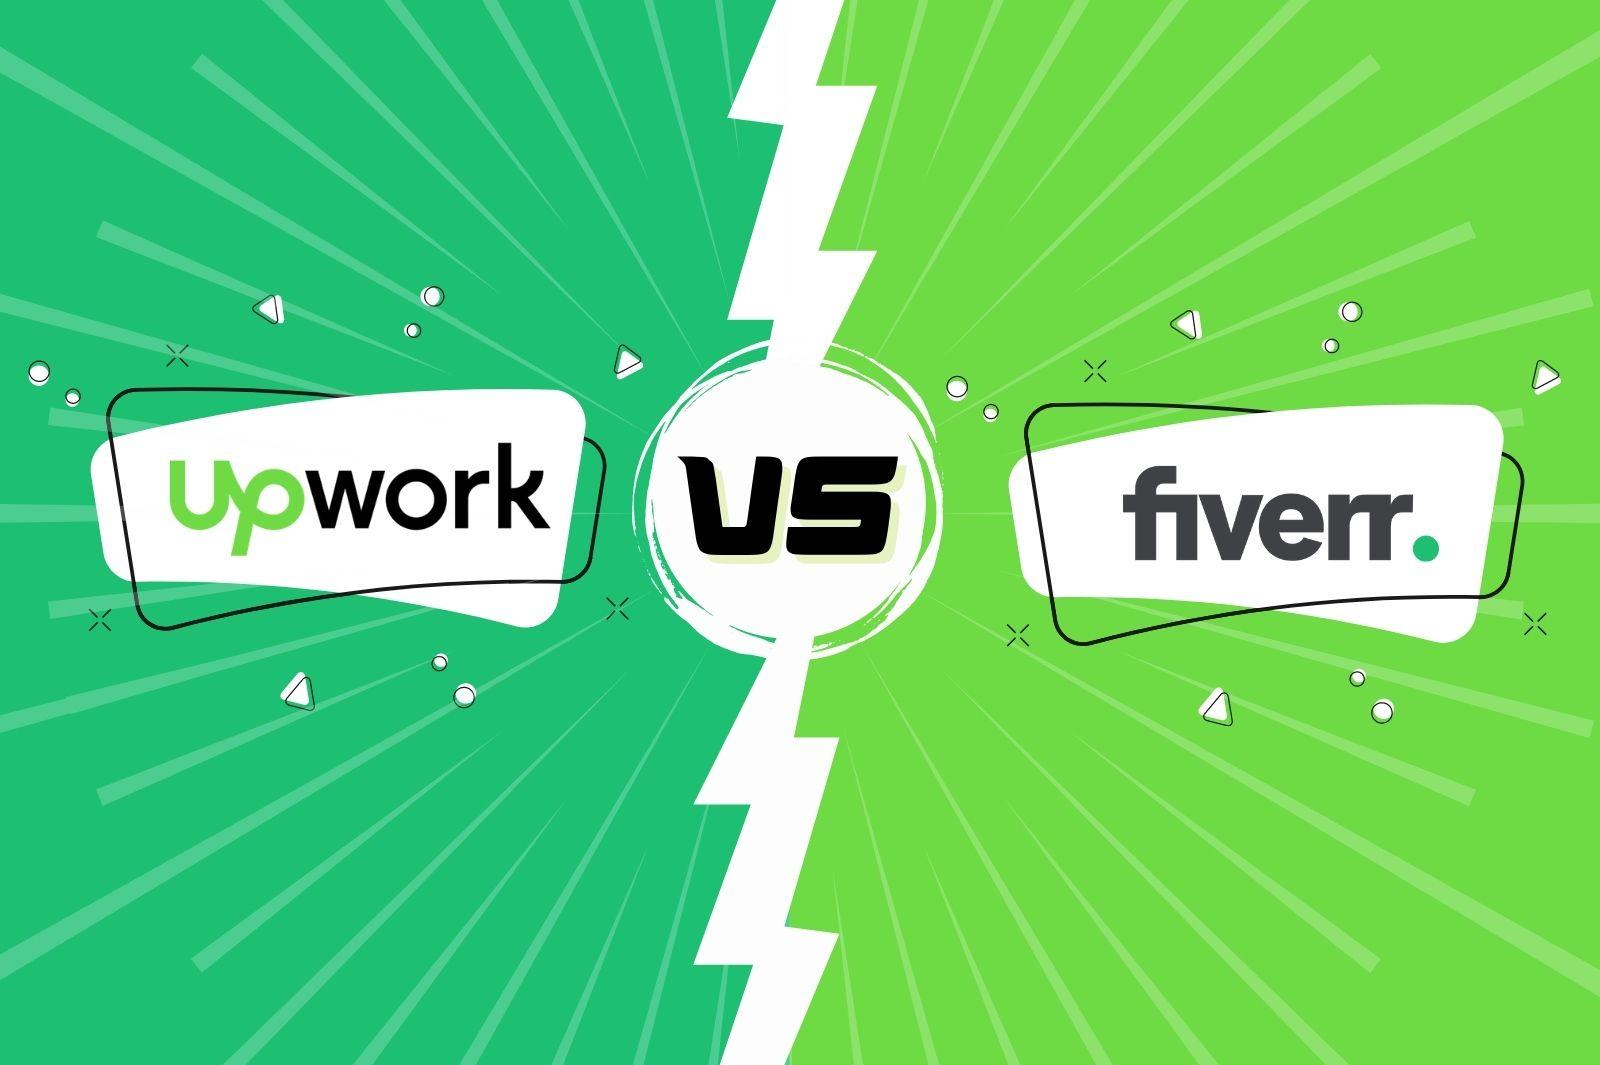 upwork vs fiverr